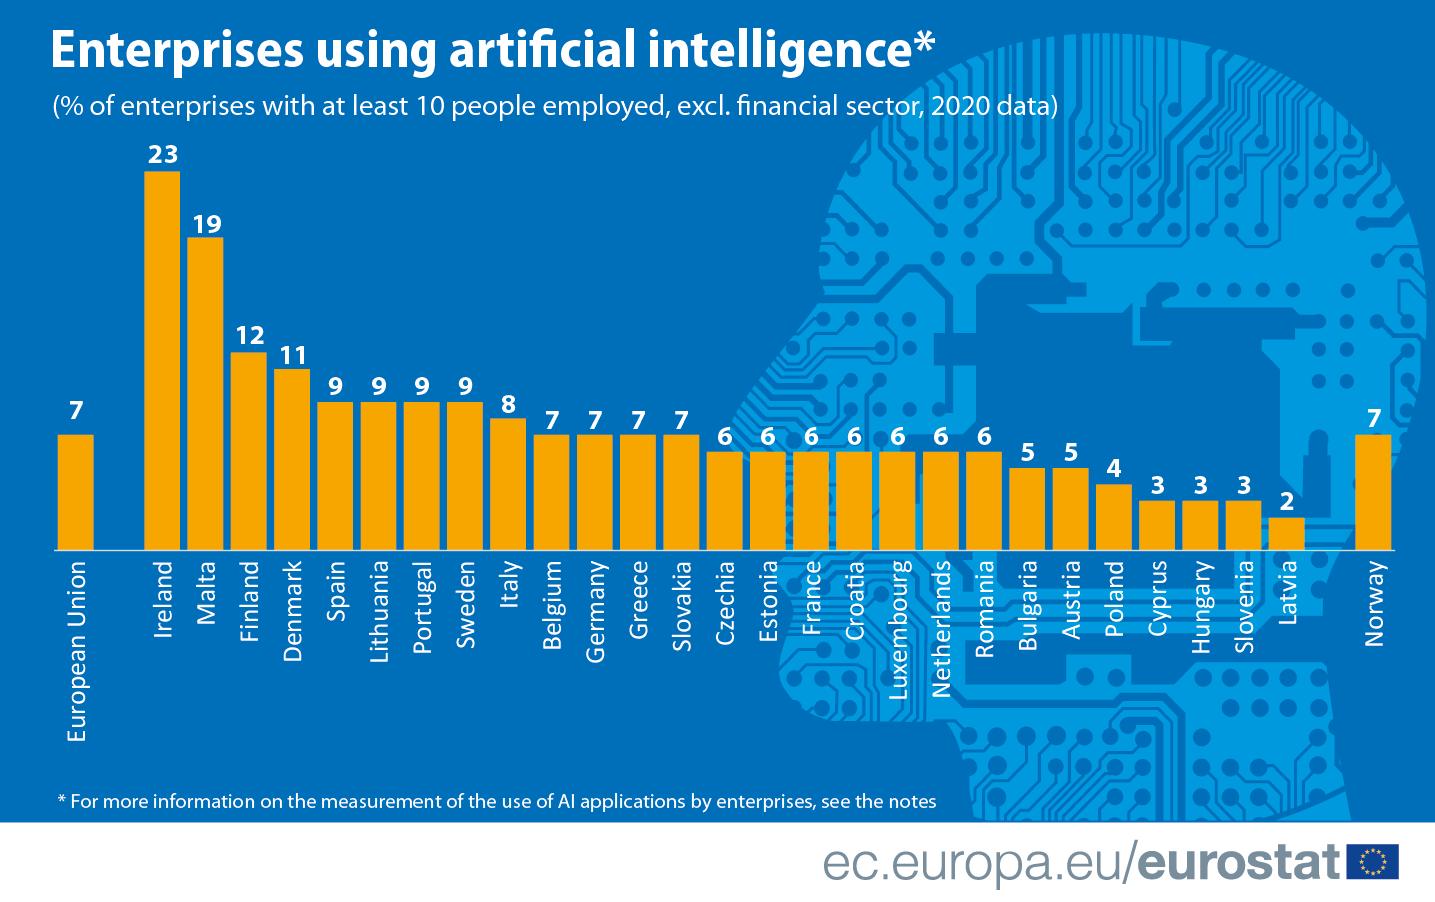 Infographic: Enterprises using artificial intelligence